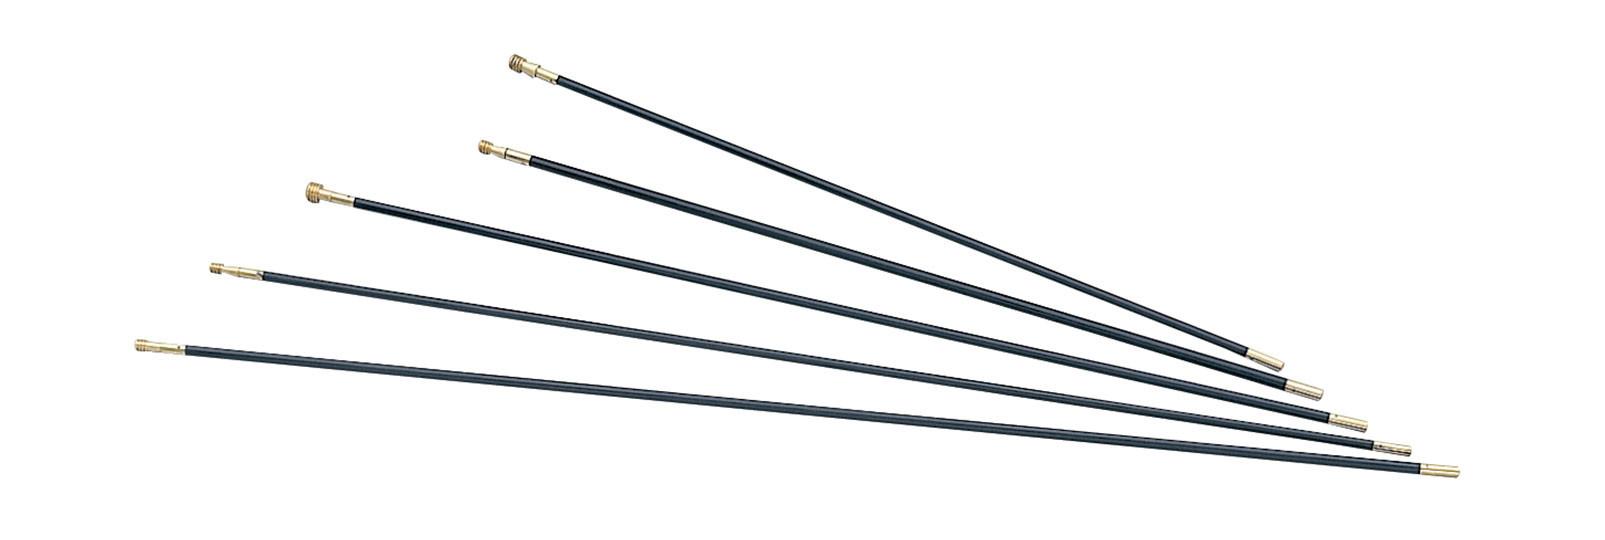 Shotgun fiberglass rod 10